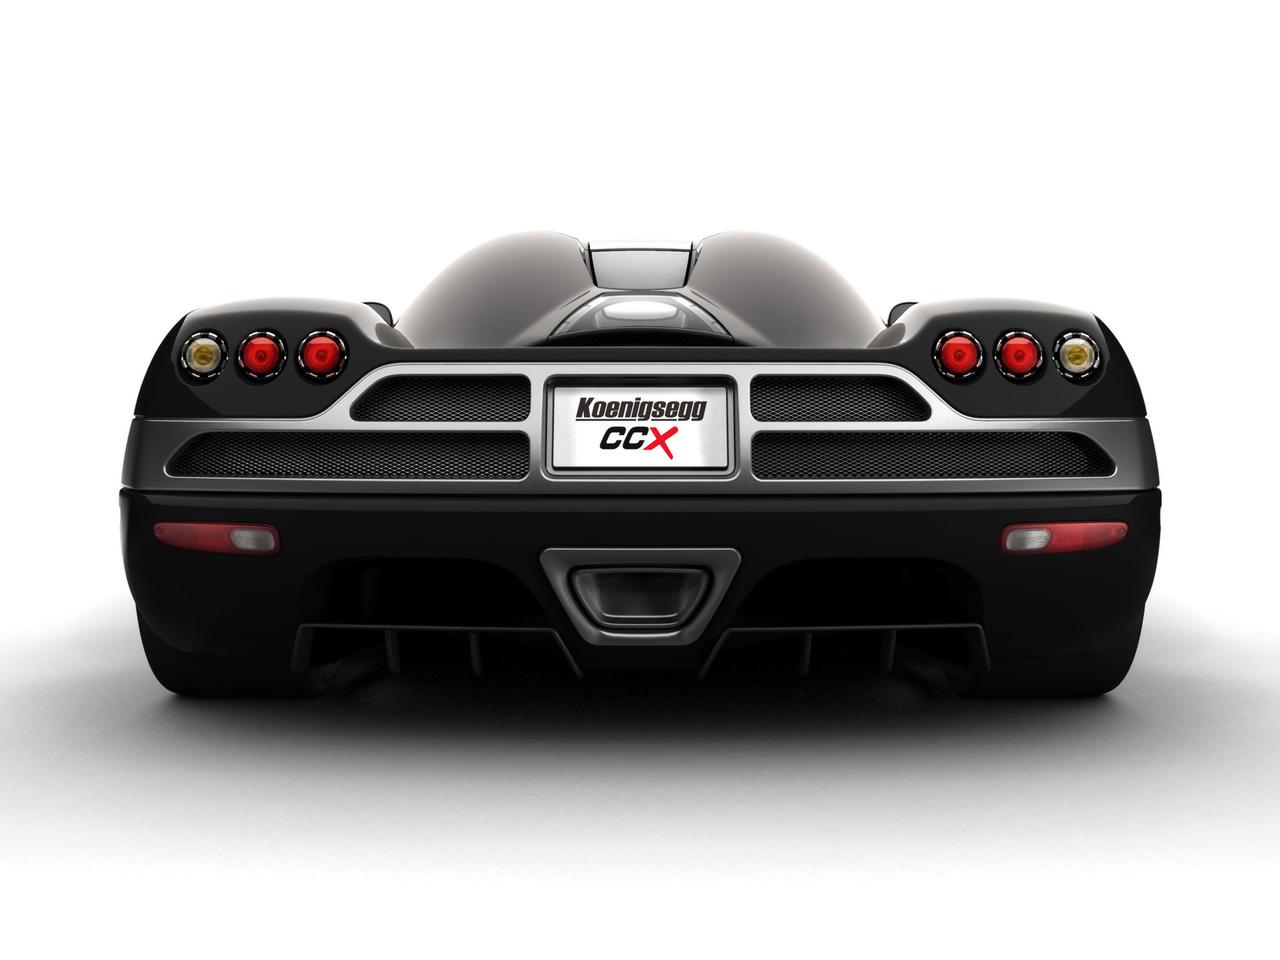 Koenigsegg CCX Wallpapers